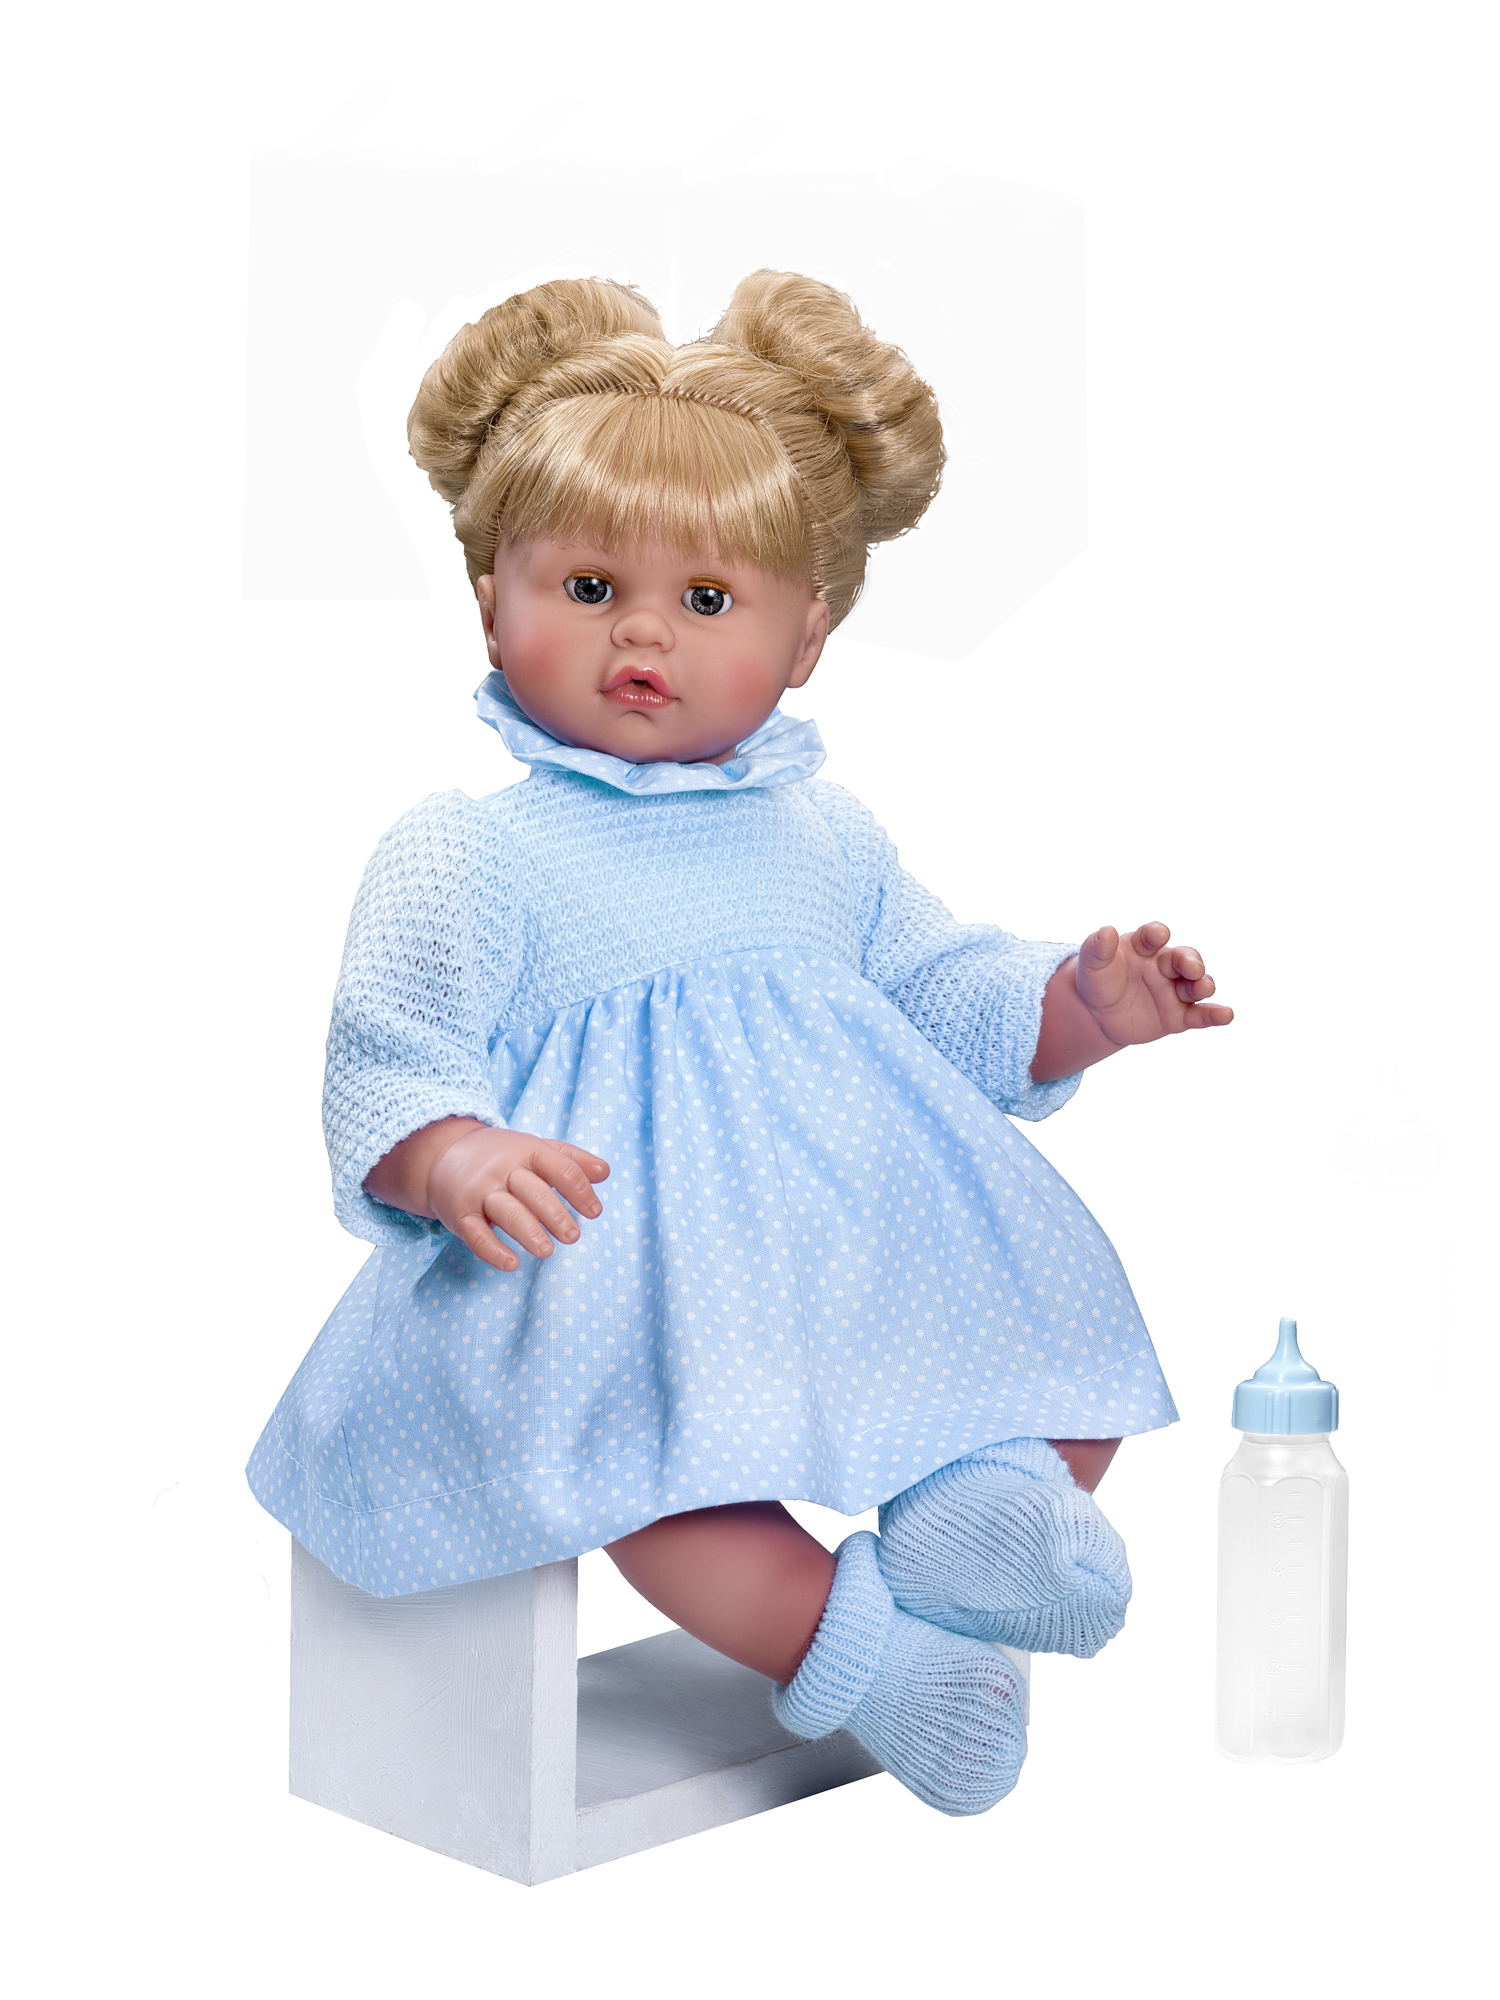 Кукла Хлоя с бутылочкой, 45 см.Куклы ASI (Испания)<br>Кукла Хлоя с бутылочкой, 45 см.<br>